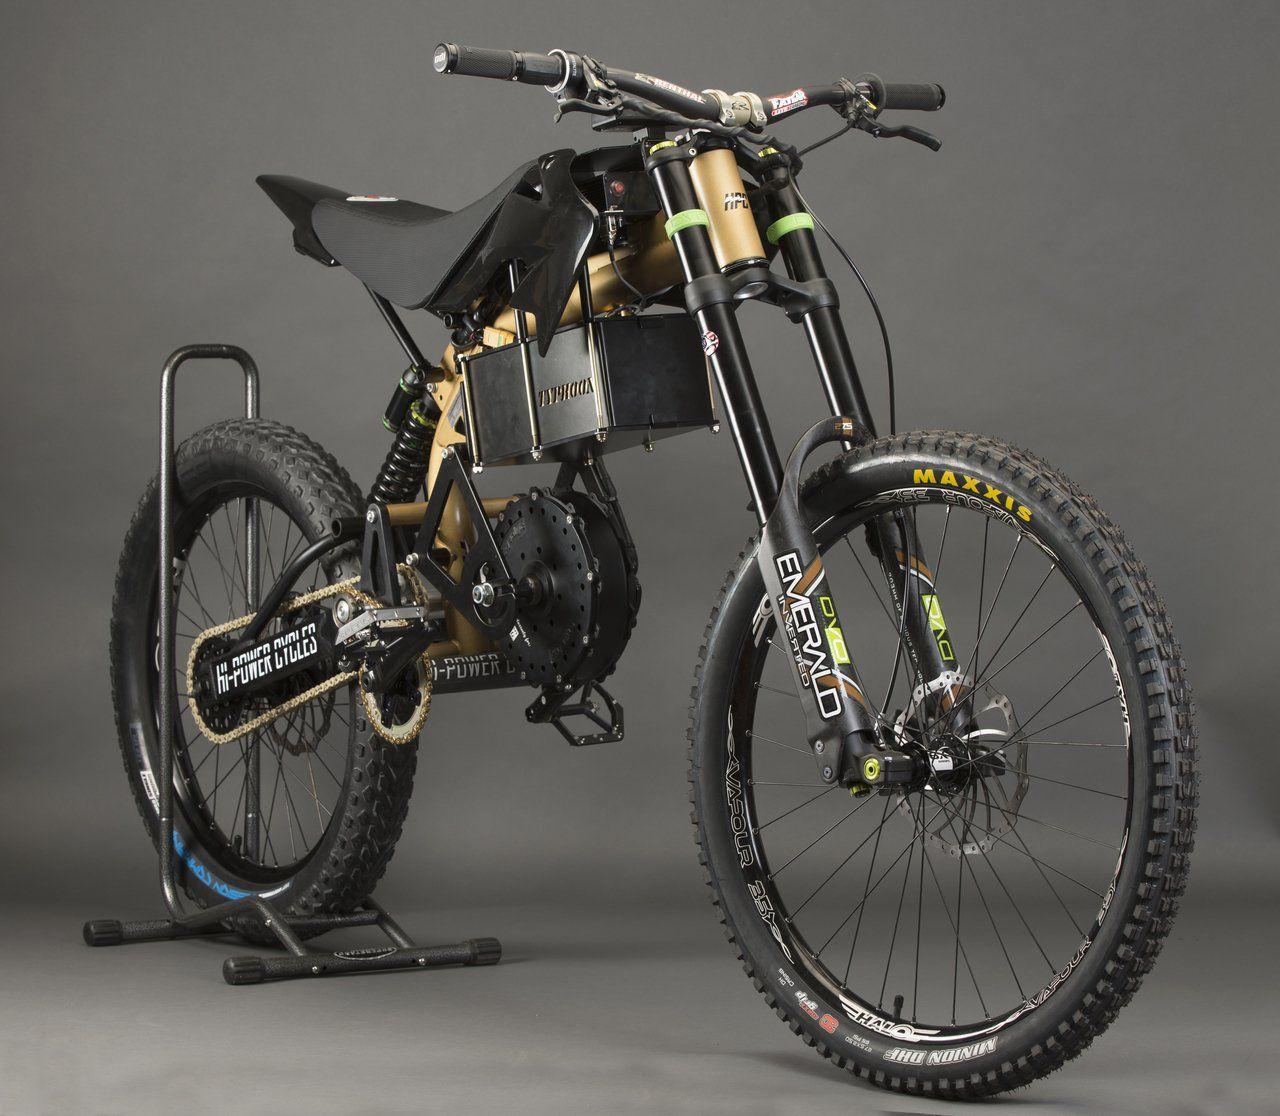 2020 Hpc Typhoon Pro Offroad High Performance Electric Dirt Bike